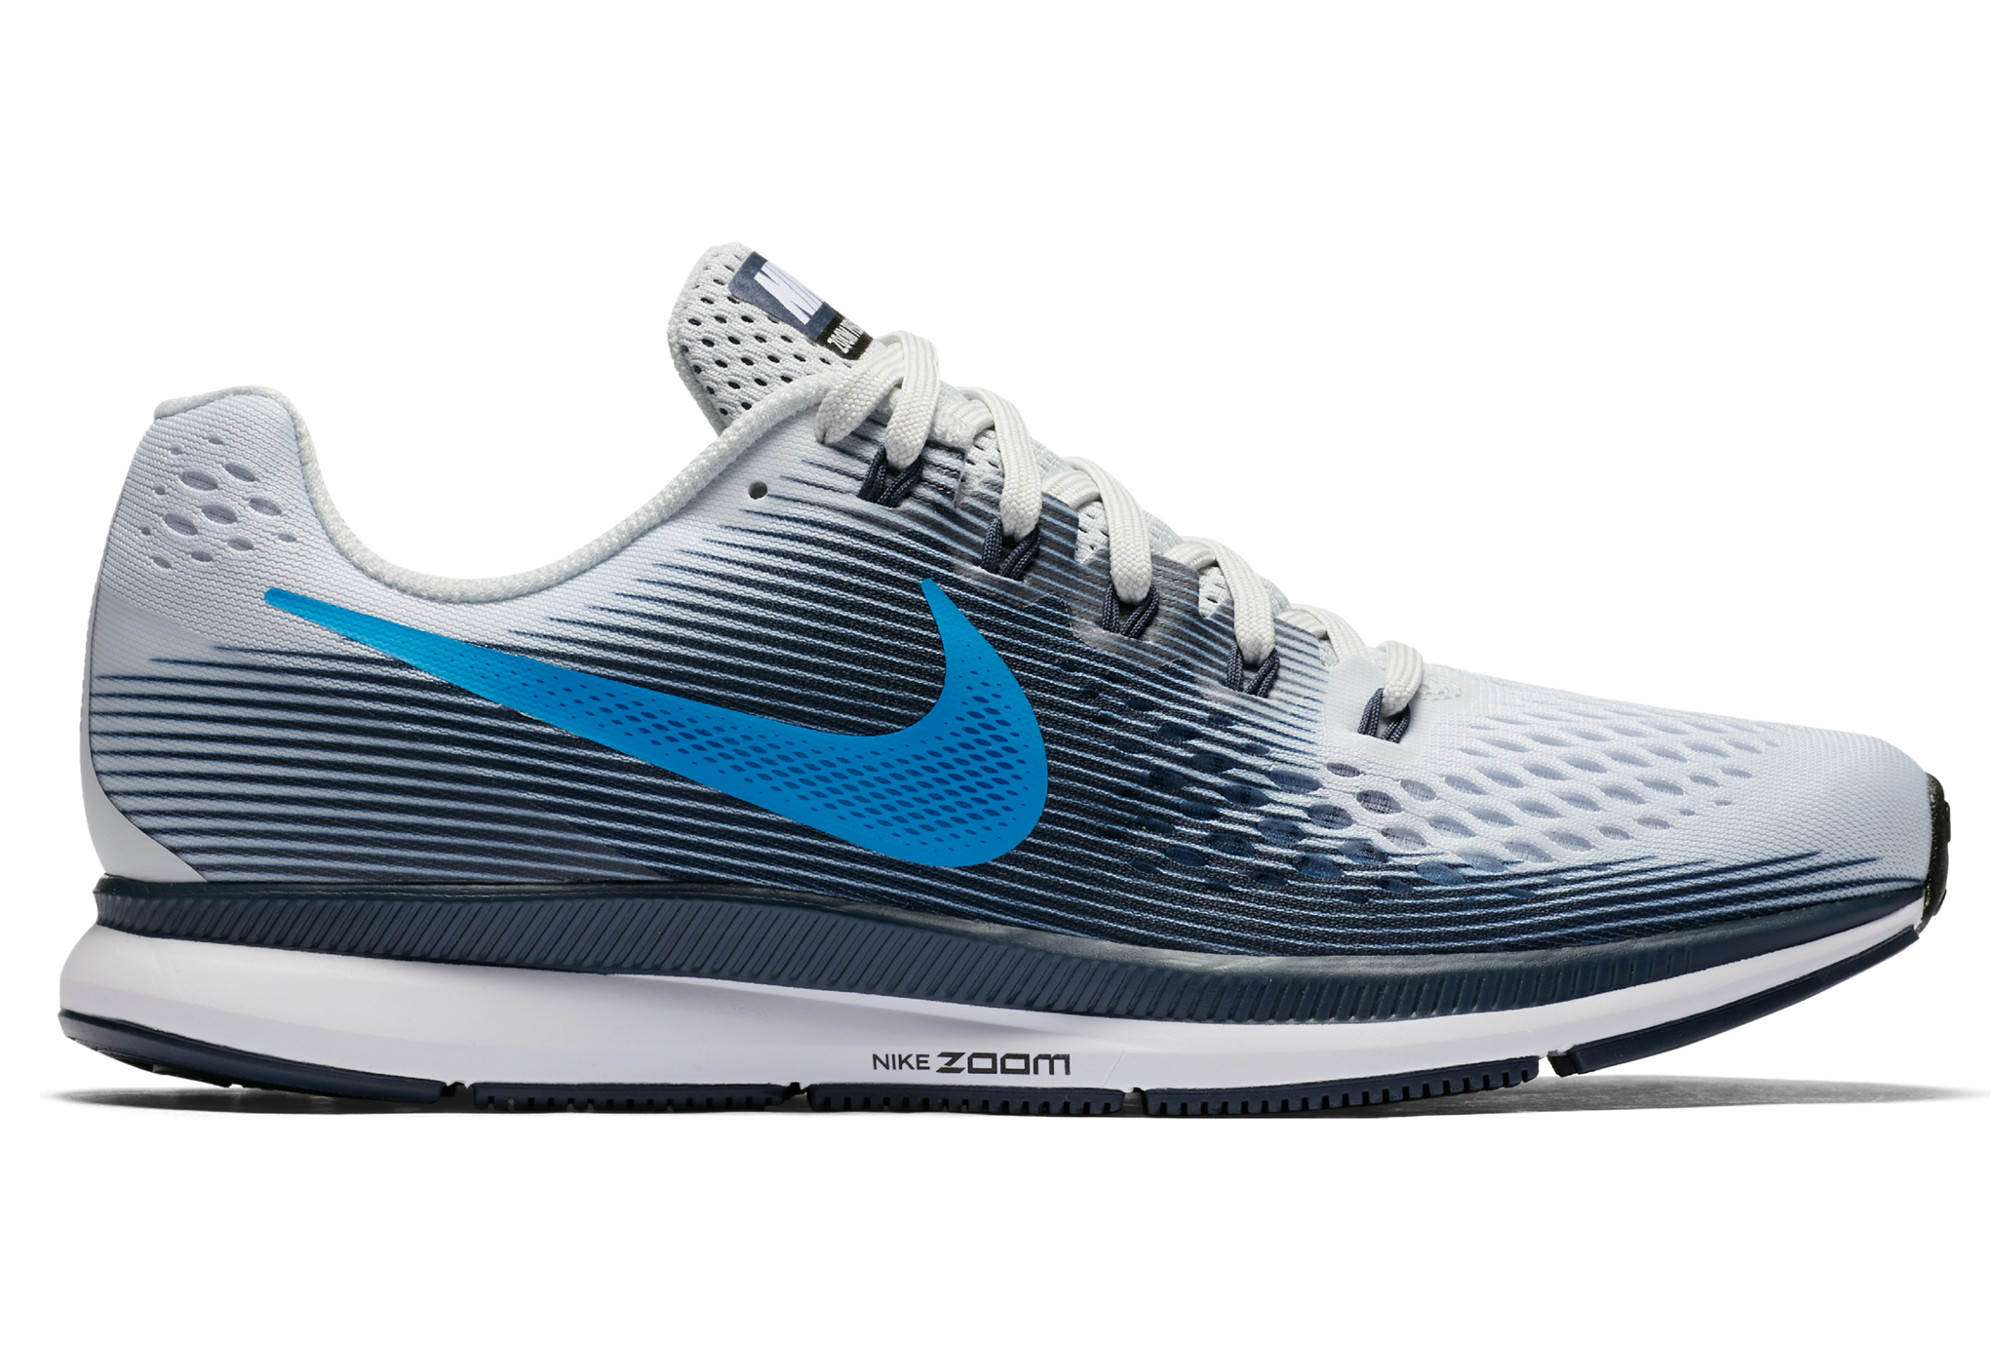 hot sale online d7205 1d21a Zapatillas Nike Air Zoom Pegasus 34 para Hombre Blanco   Azul